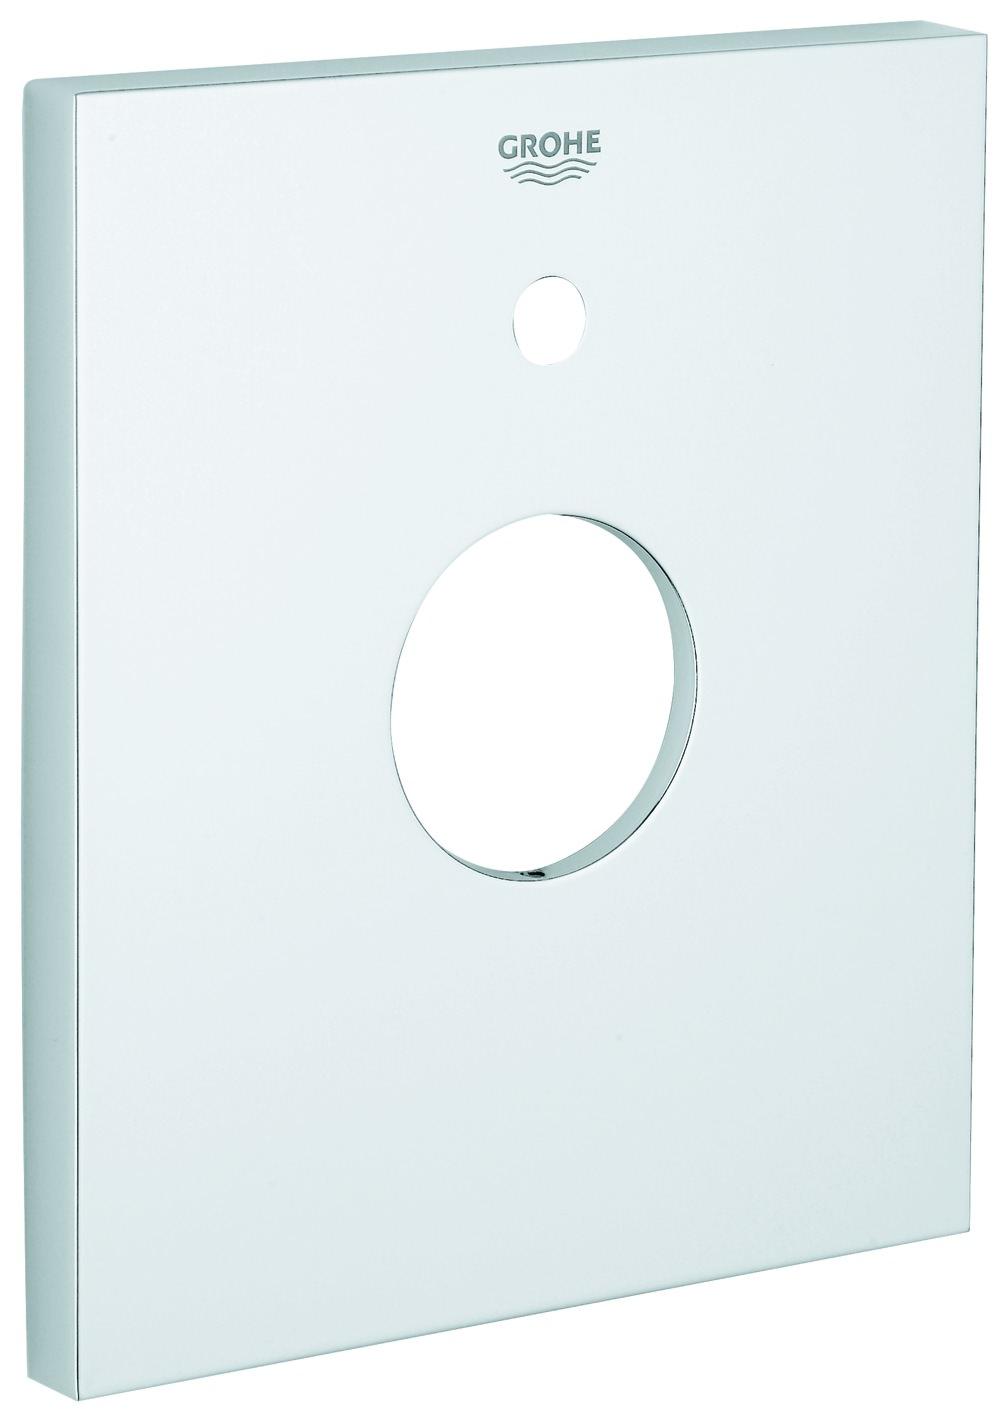 grohe allure quadra rosette f r wannenbatterie chrom 46614000. Black Bedroom Furniture Sets. Home Design Ideas